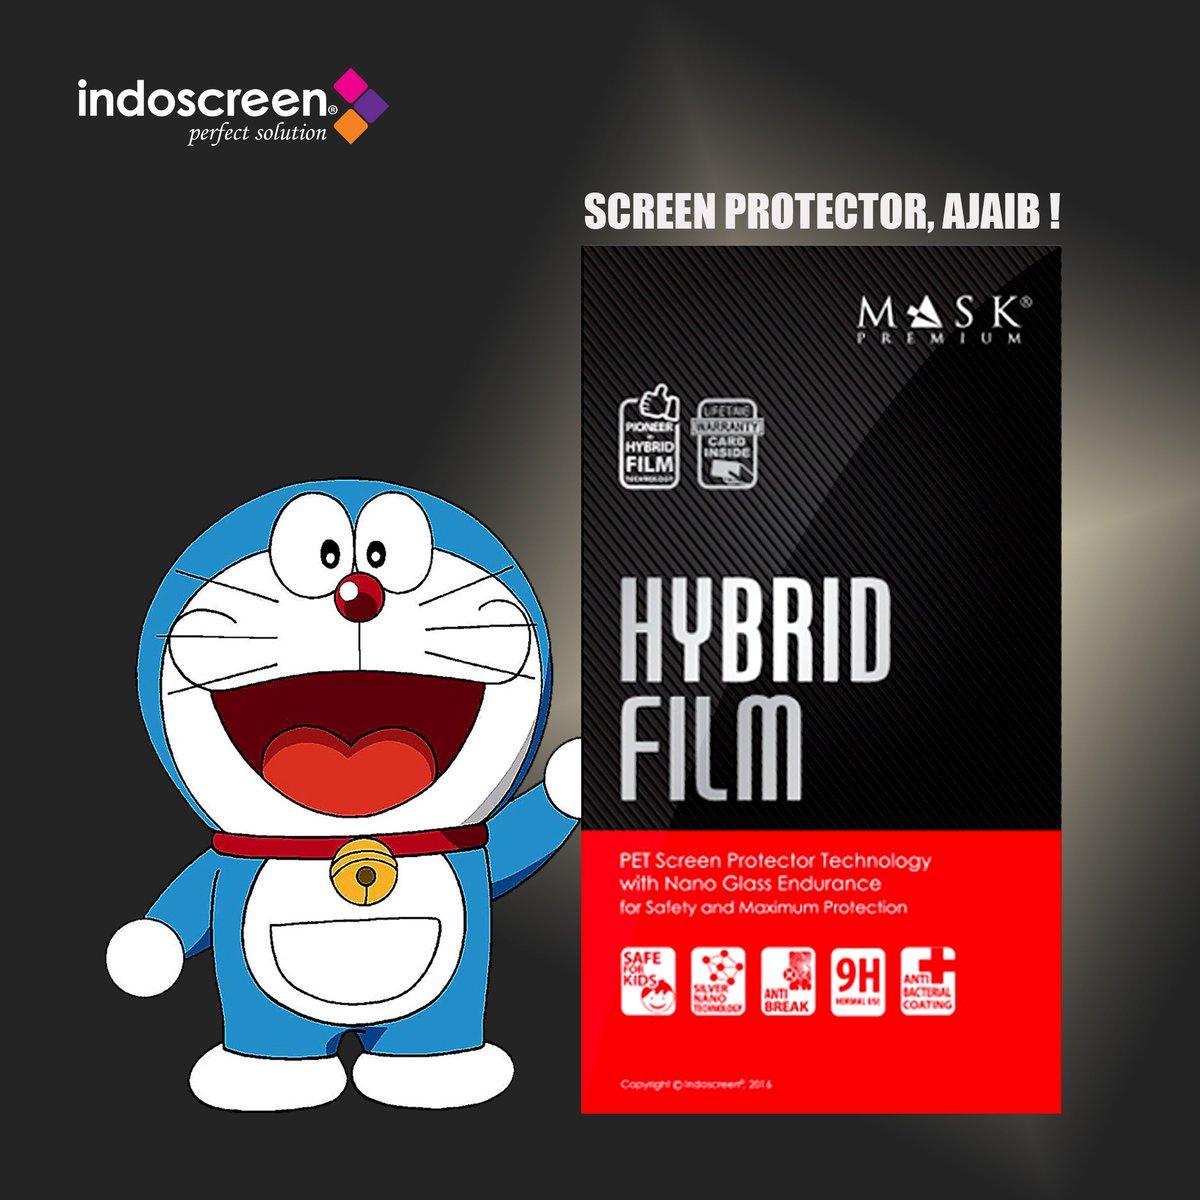 Indoscreen On Twitter Bagai Screen Protector Dari Kantong Ajaib Doraemon Hybrid Film Adalah Yang Sempurna Untuk Melindungi Layar Hp Mu